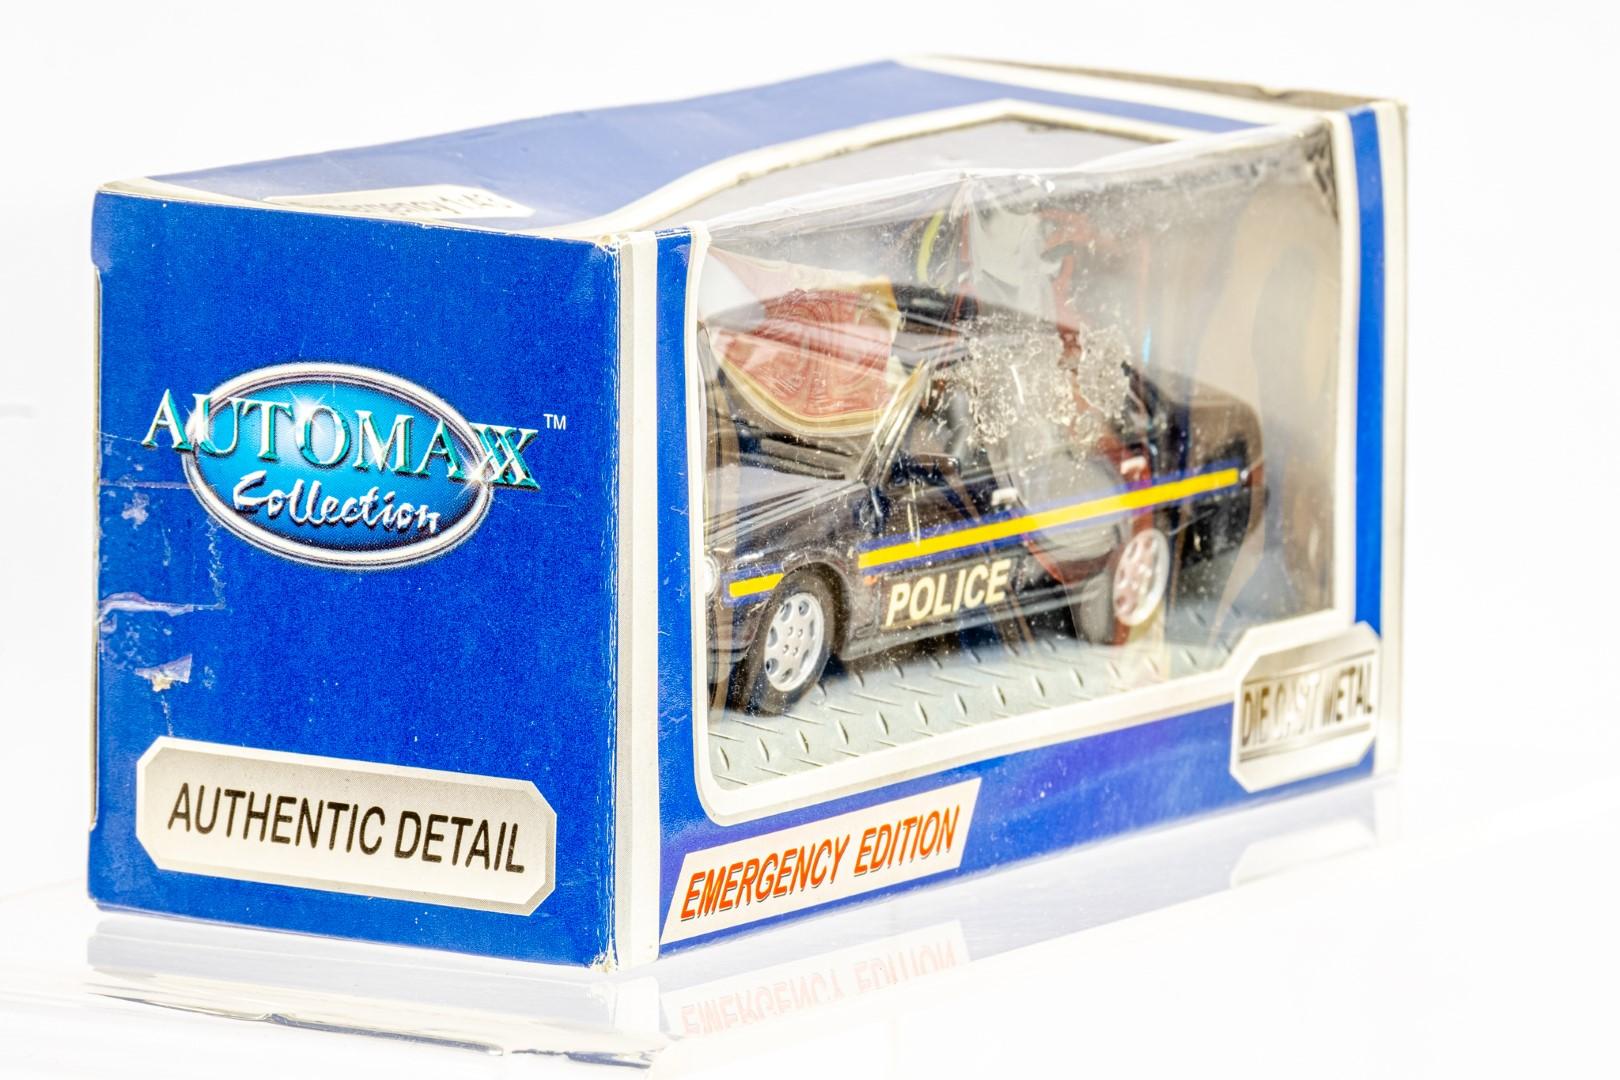 Automax Ford Granada - Police - Code 3 - Image 2 of 7